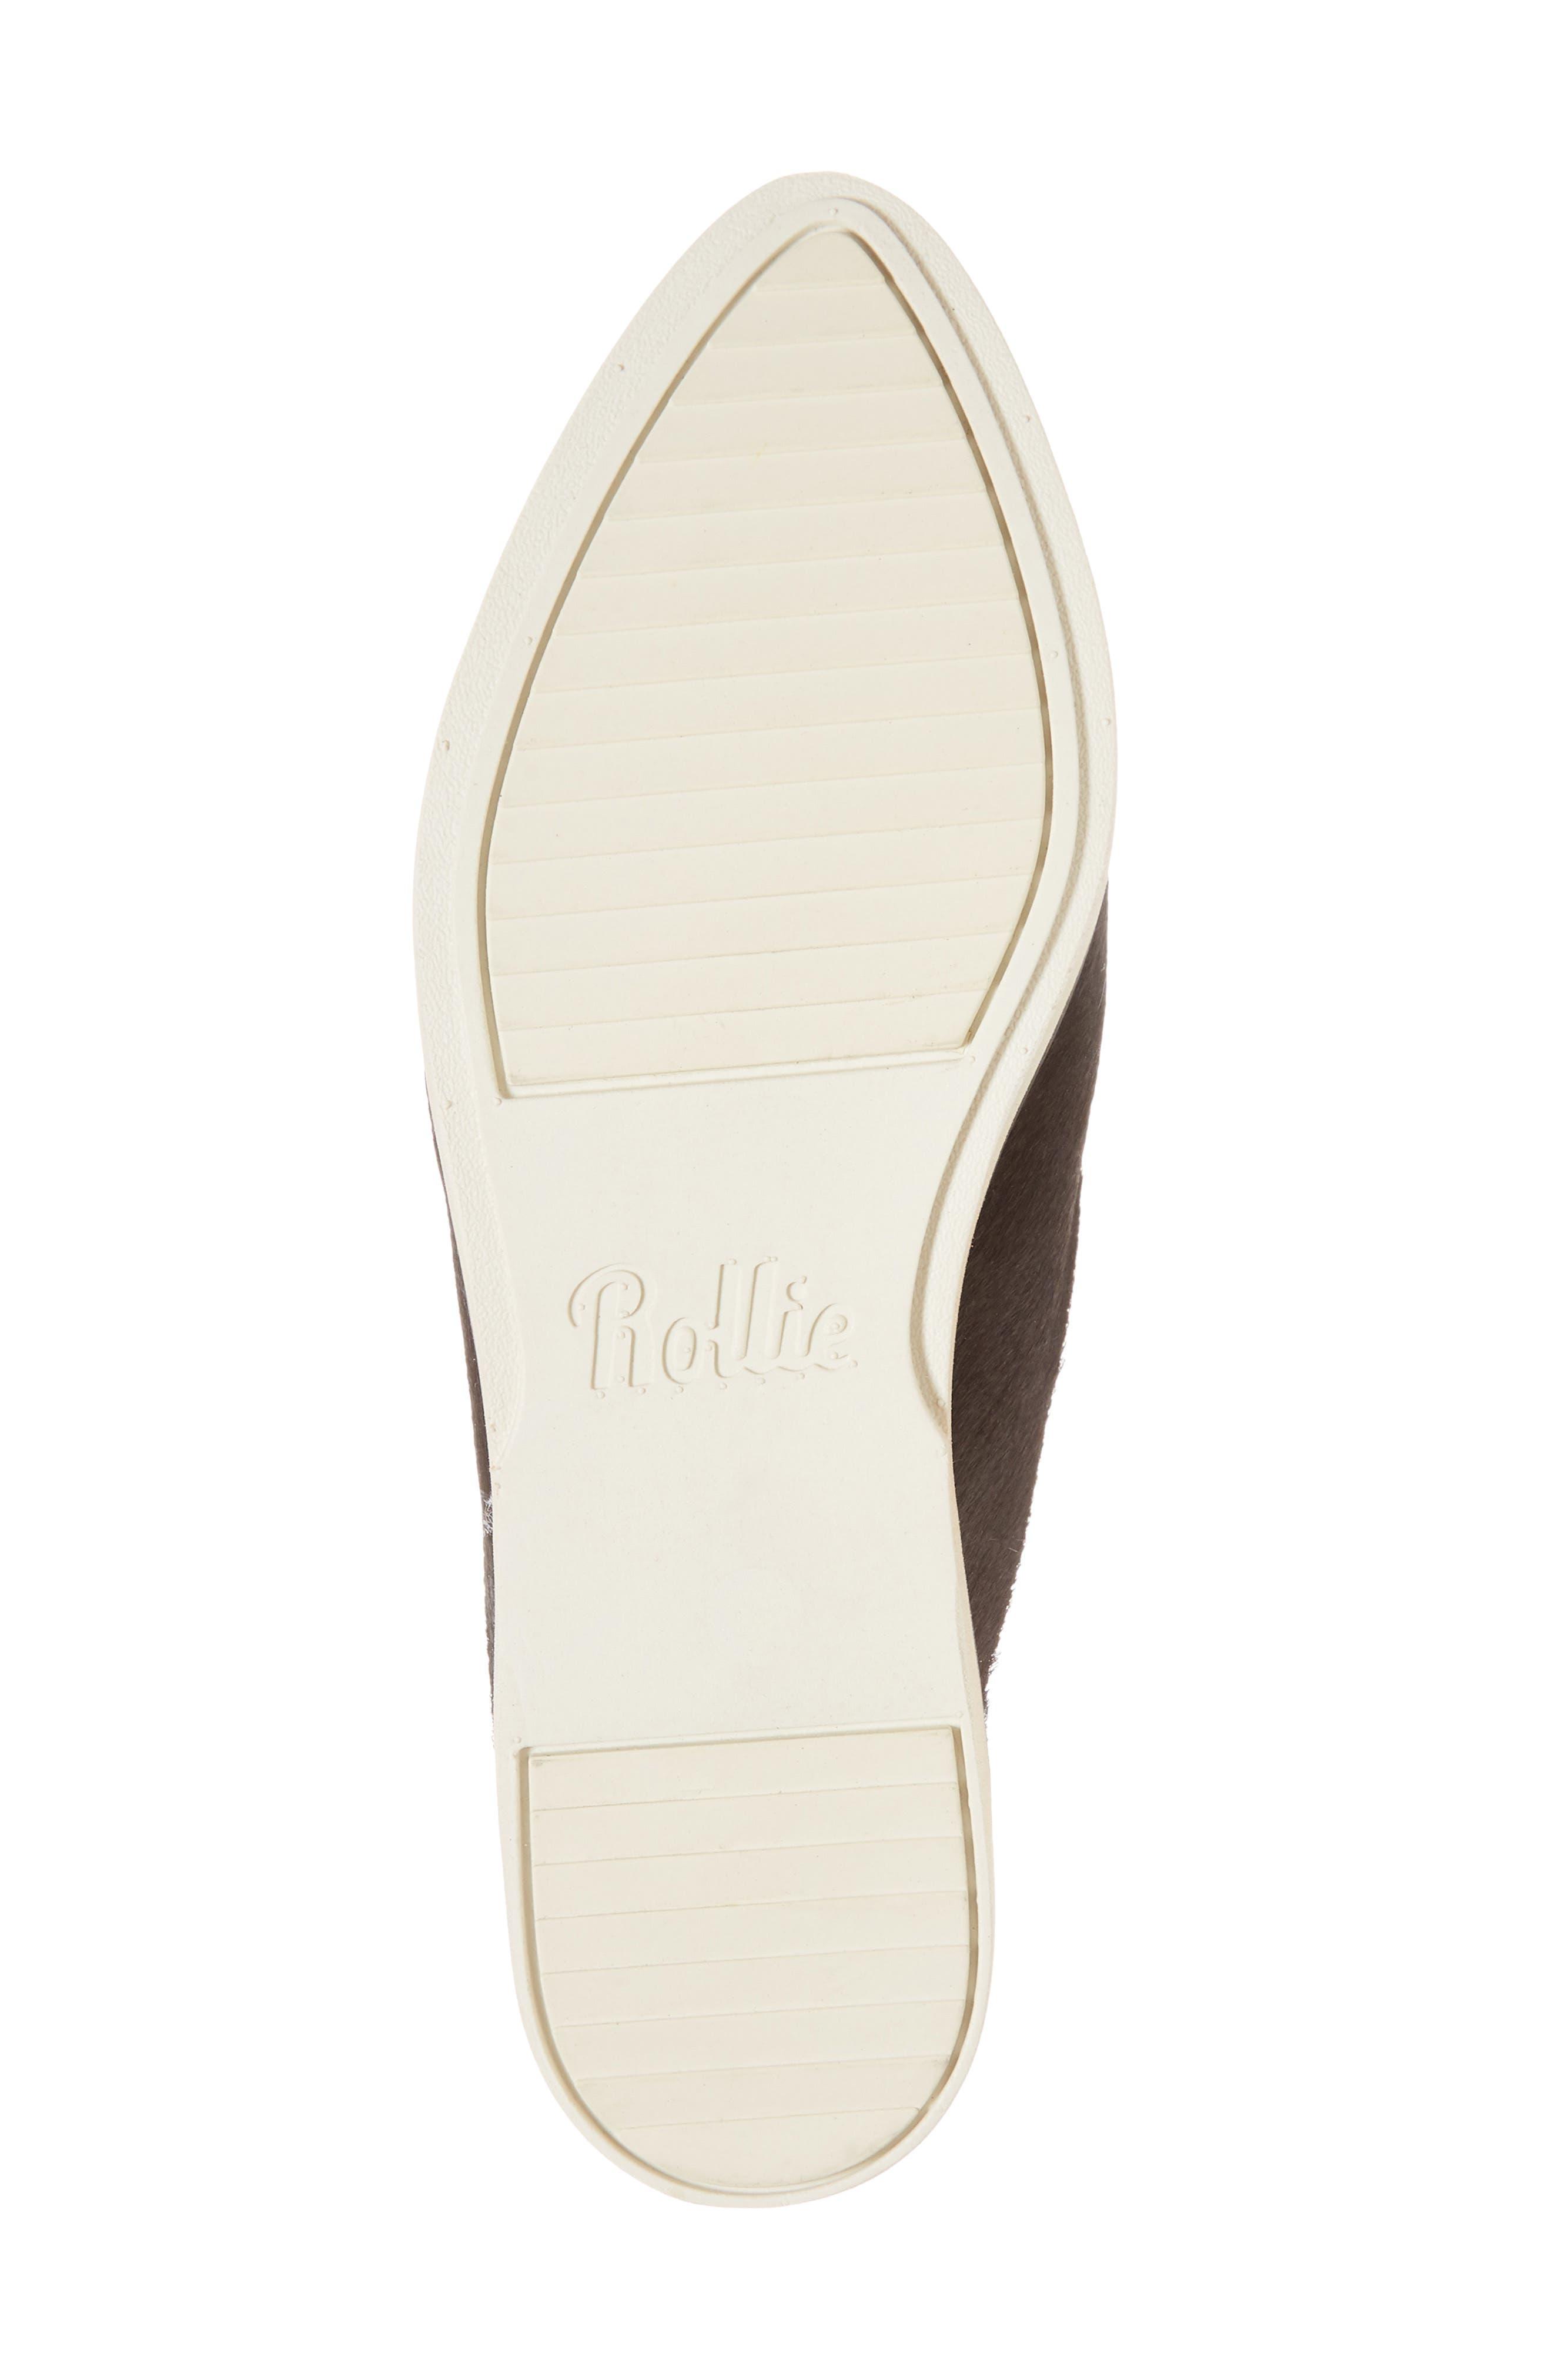 Madison Studded Genuine Calf Hair Loafer Mule,                             Alternate thumbnail 6, color,                             Black Calf Hair